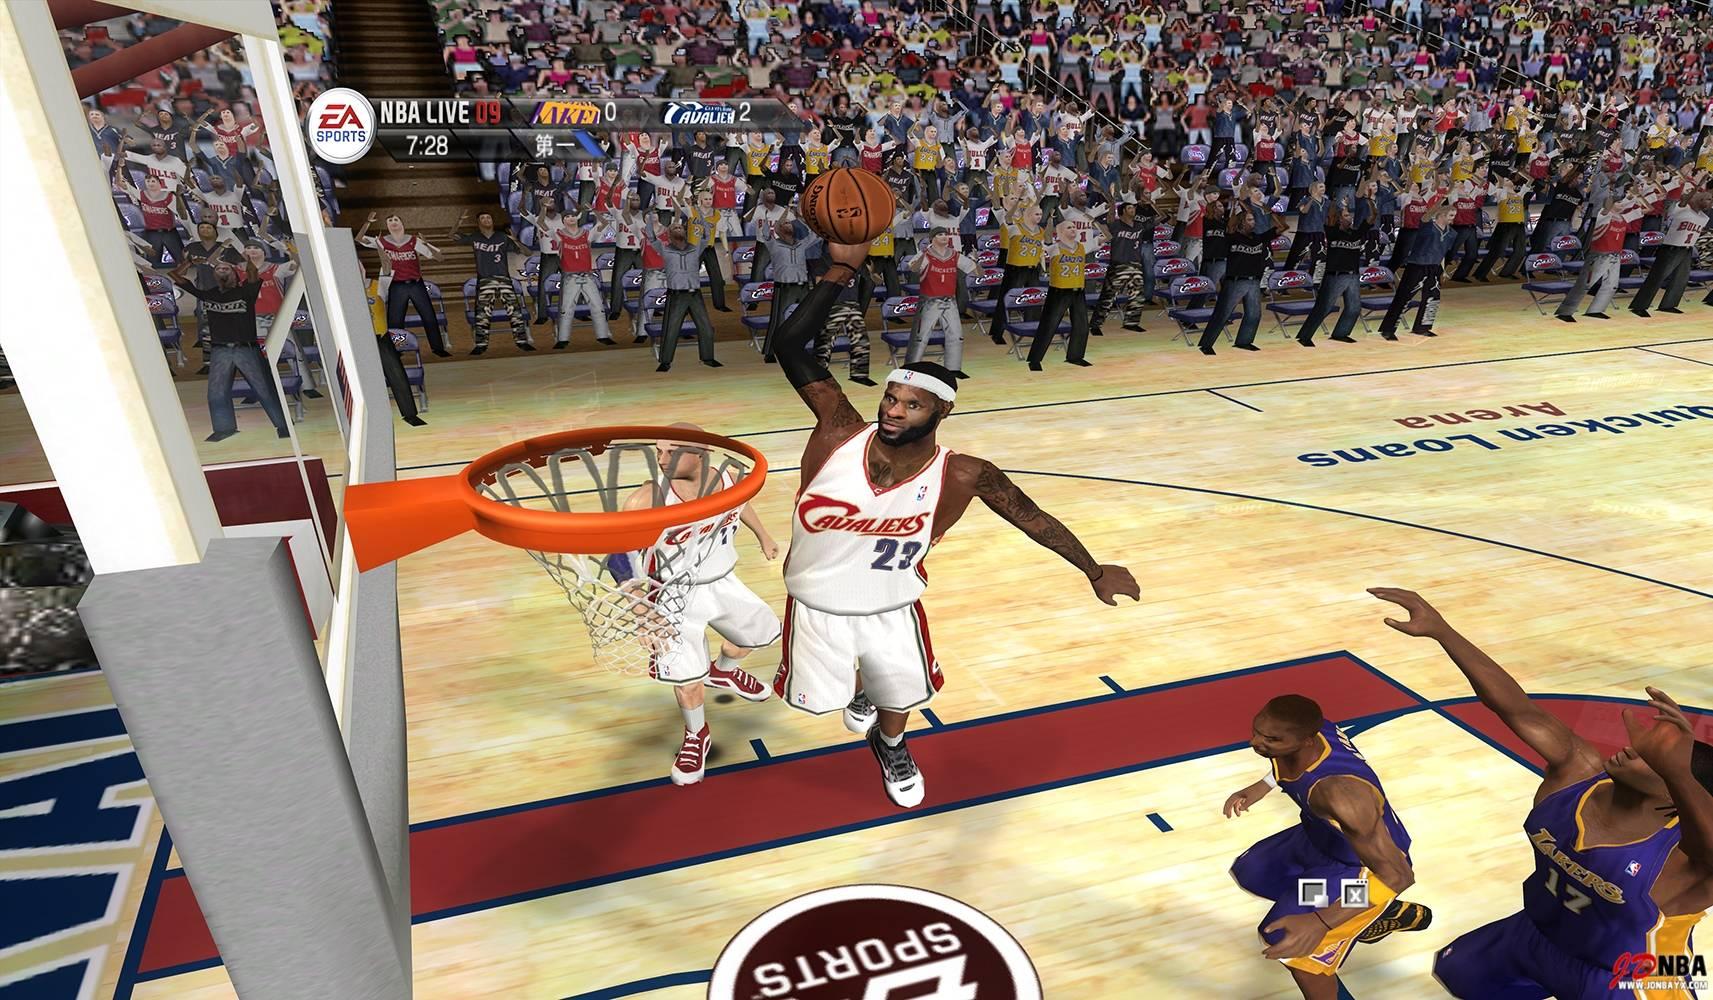 NBA LIVE 09【4K】-2021-06-25-23-36-44-303副本.jpg